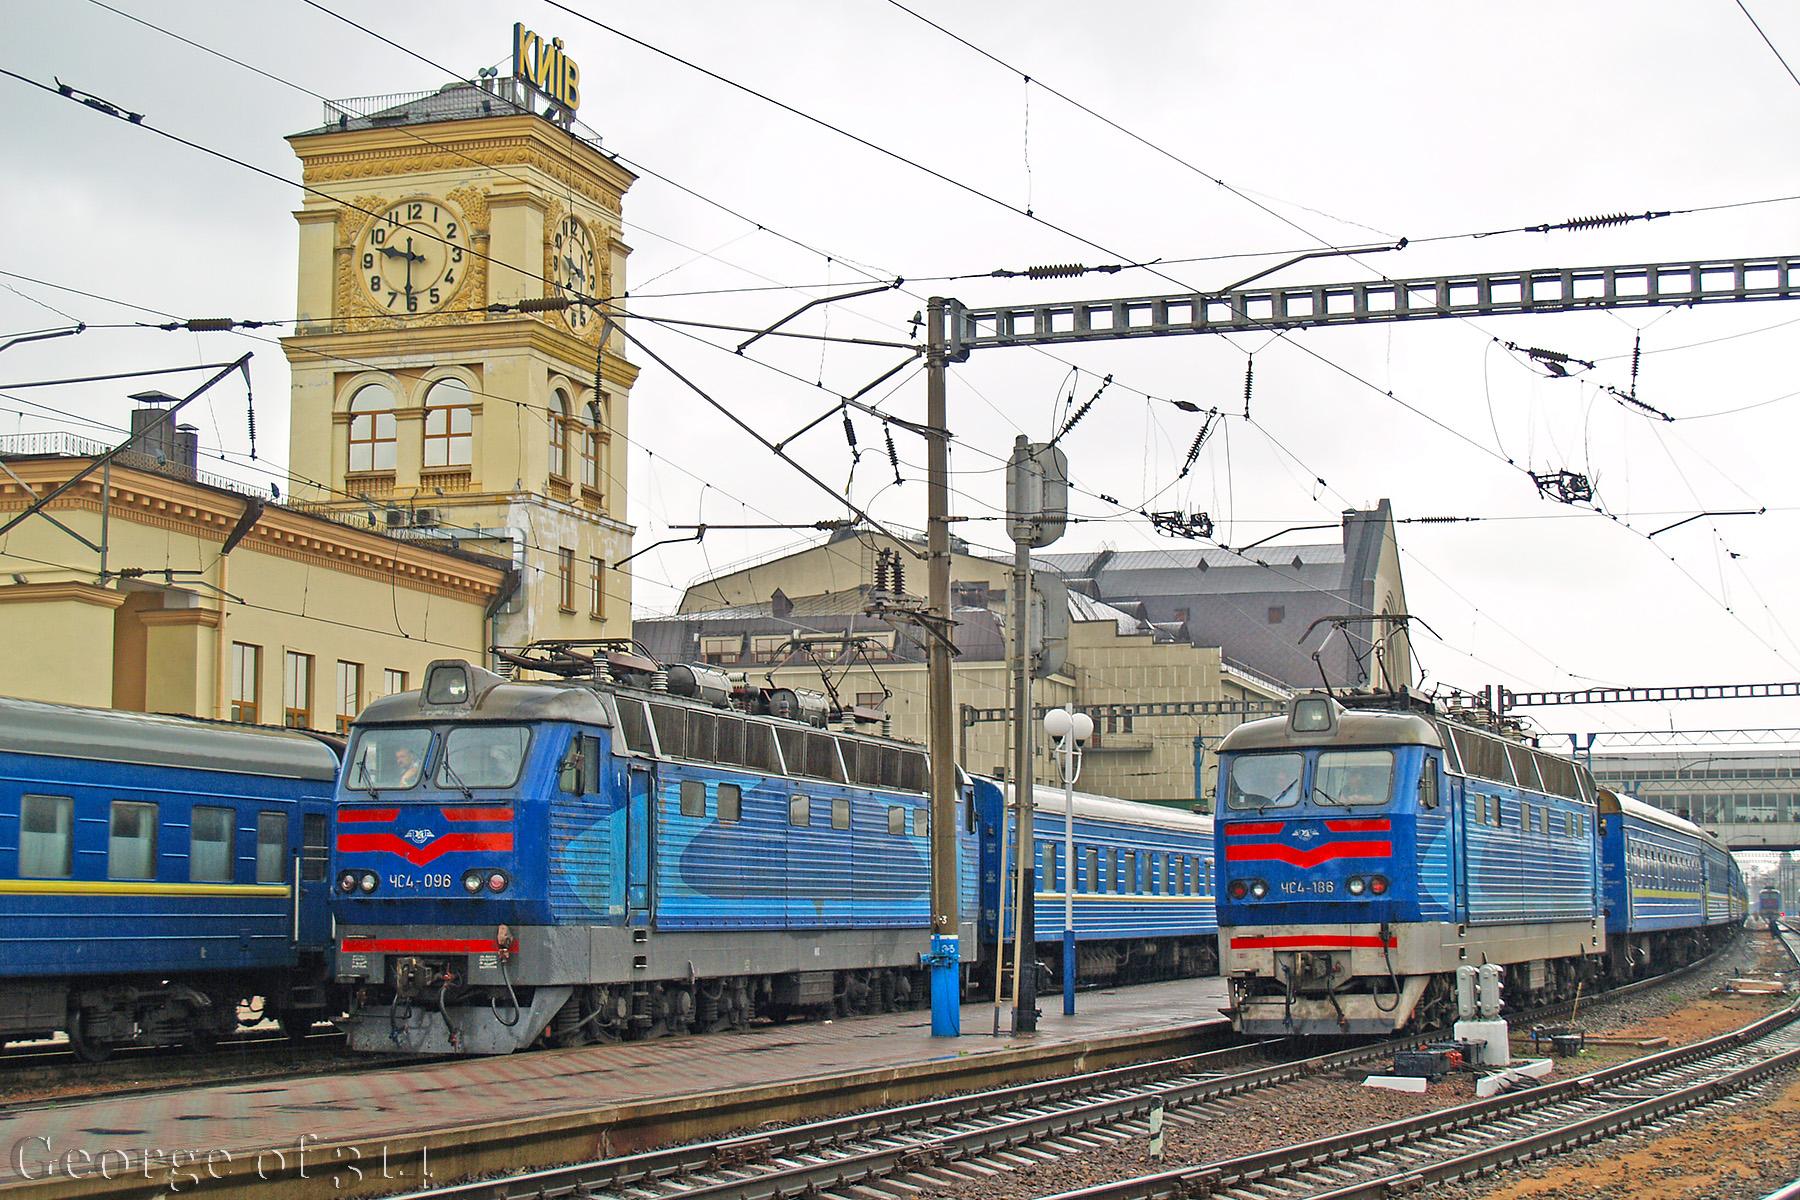 Електровози ЧС4-096 та ЧС4-186, ст. Київ-Пасажирський